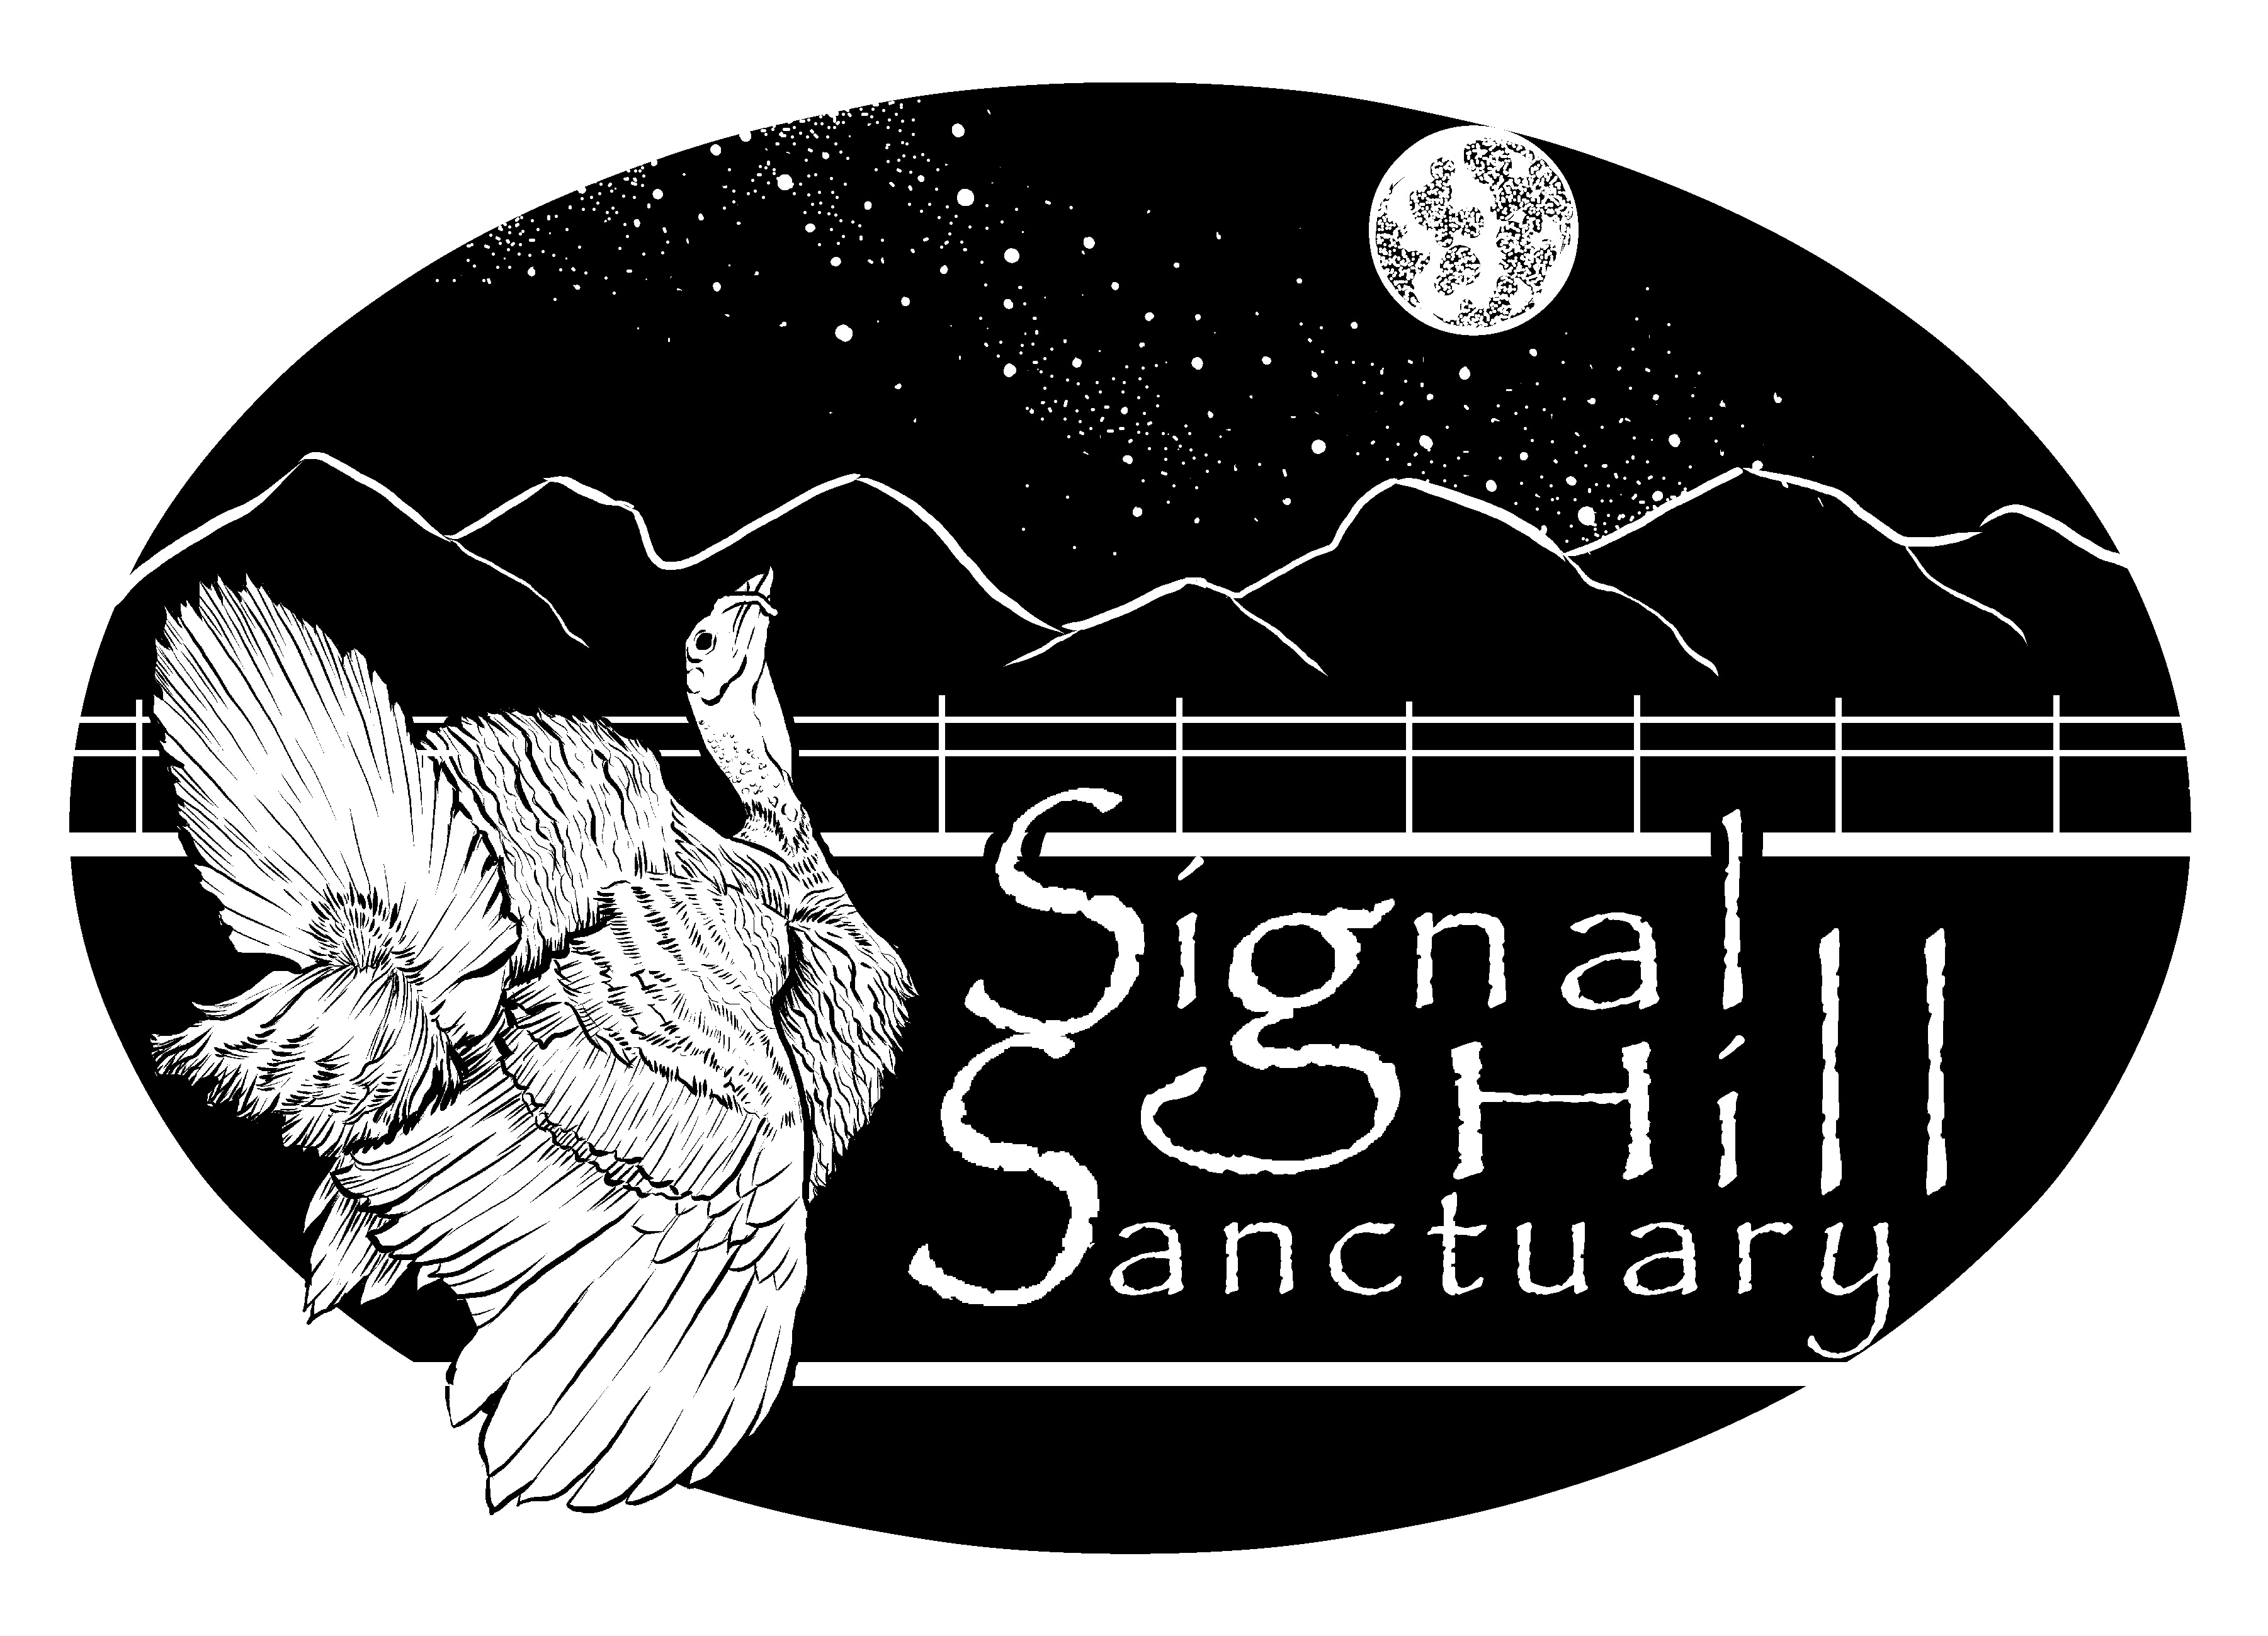 Signal Hill Sanctuary